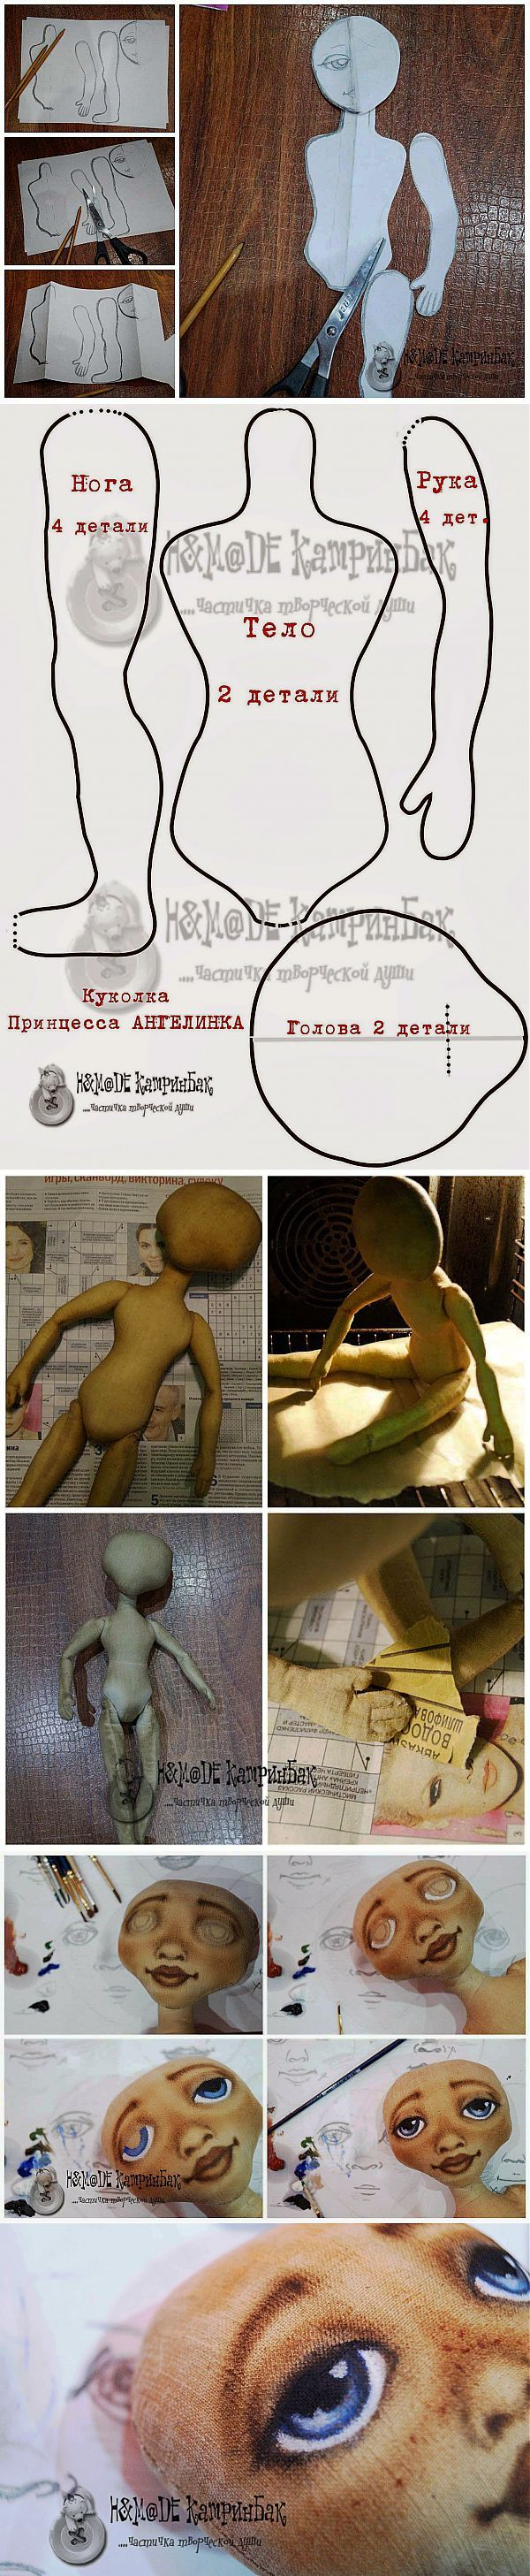 Clase magistral: ático princesa Angelinka - Masters Feria - hecho a mano, hecho a mano